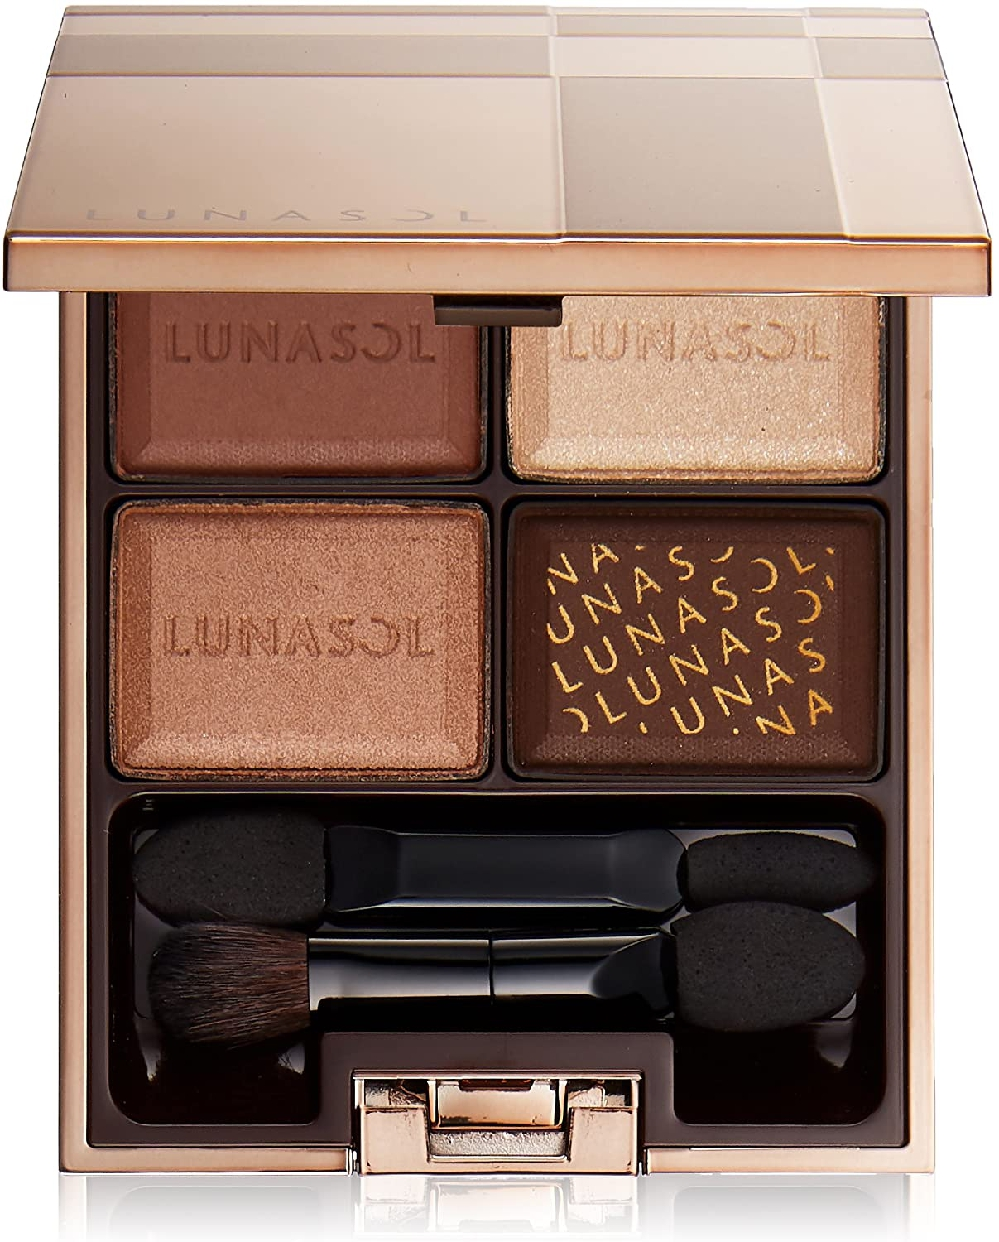 LUNASOL(ルナソル) セレクション・ドゥ・ショコラアイズ